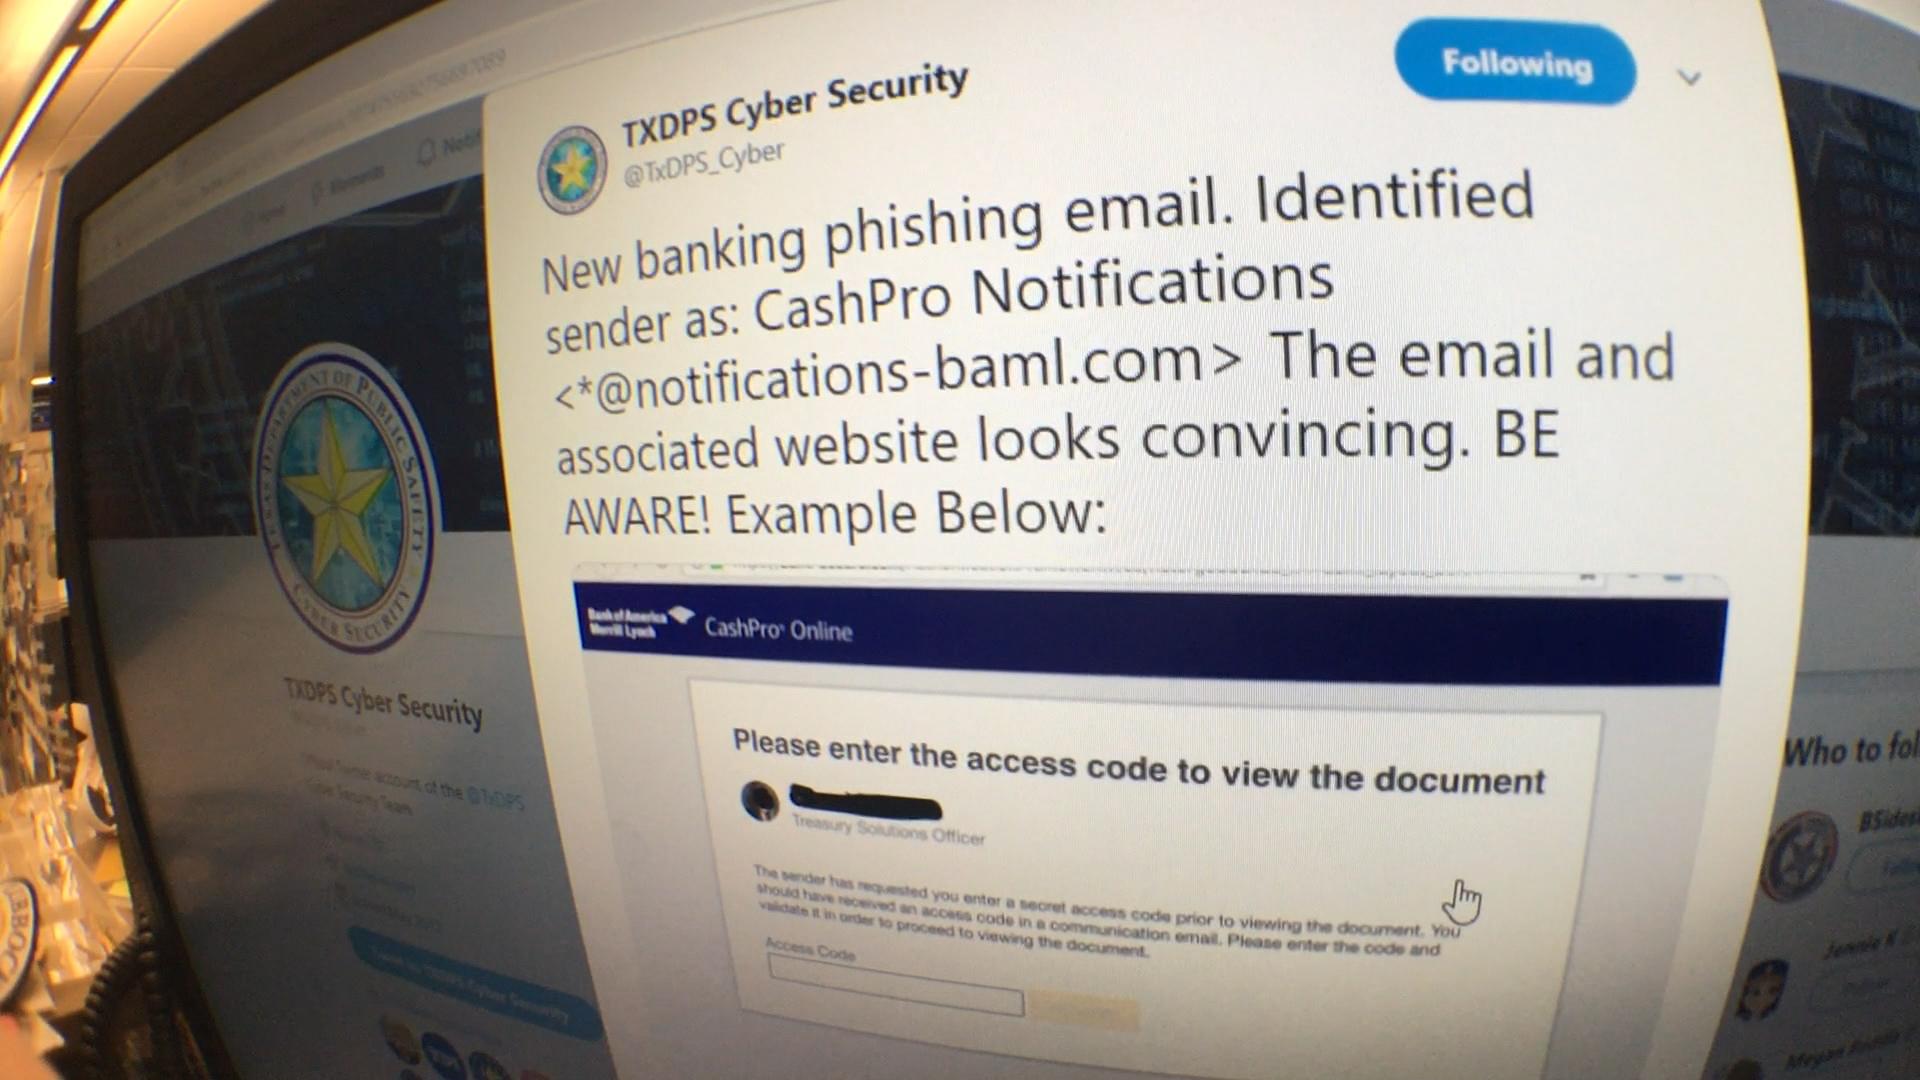 dps cyber warning_1545675678538.jpg.jpg